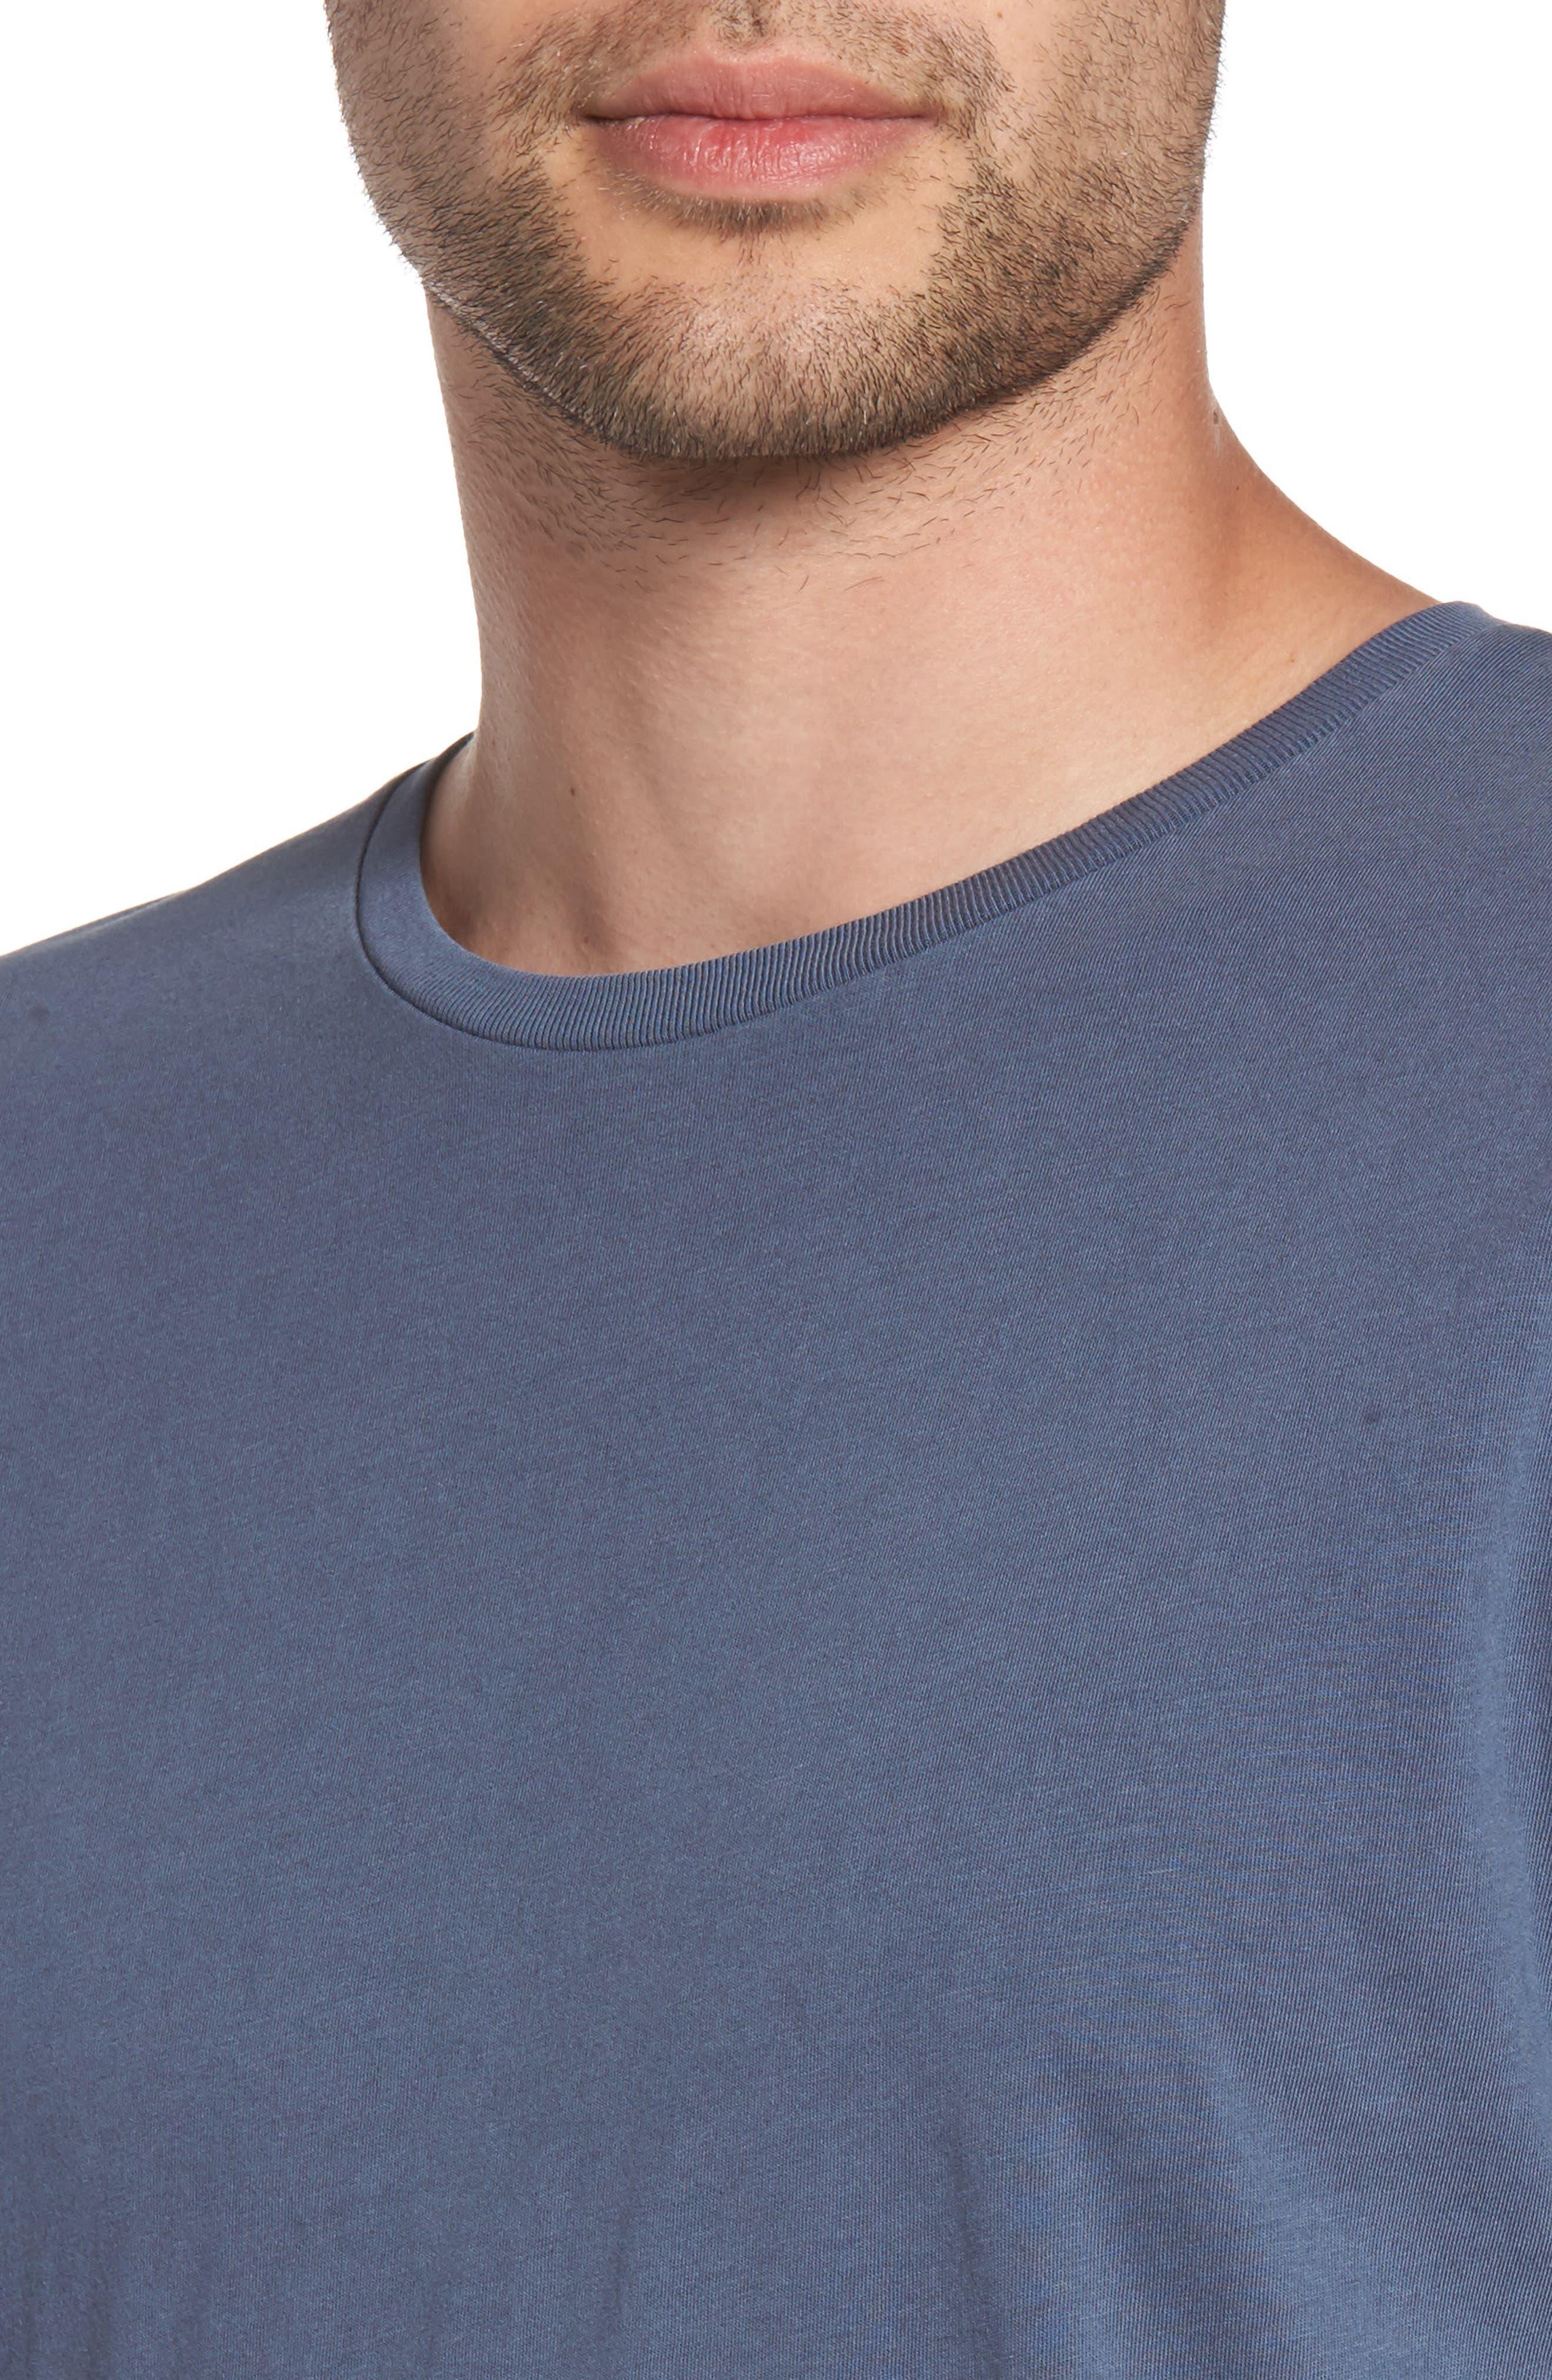 Flintlock Stripe T-Shirt,                             Alternate thumbnail 5, color,                             Pigment Blue Grey